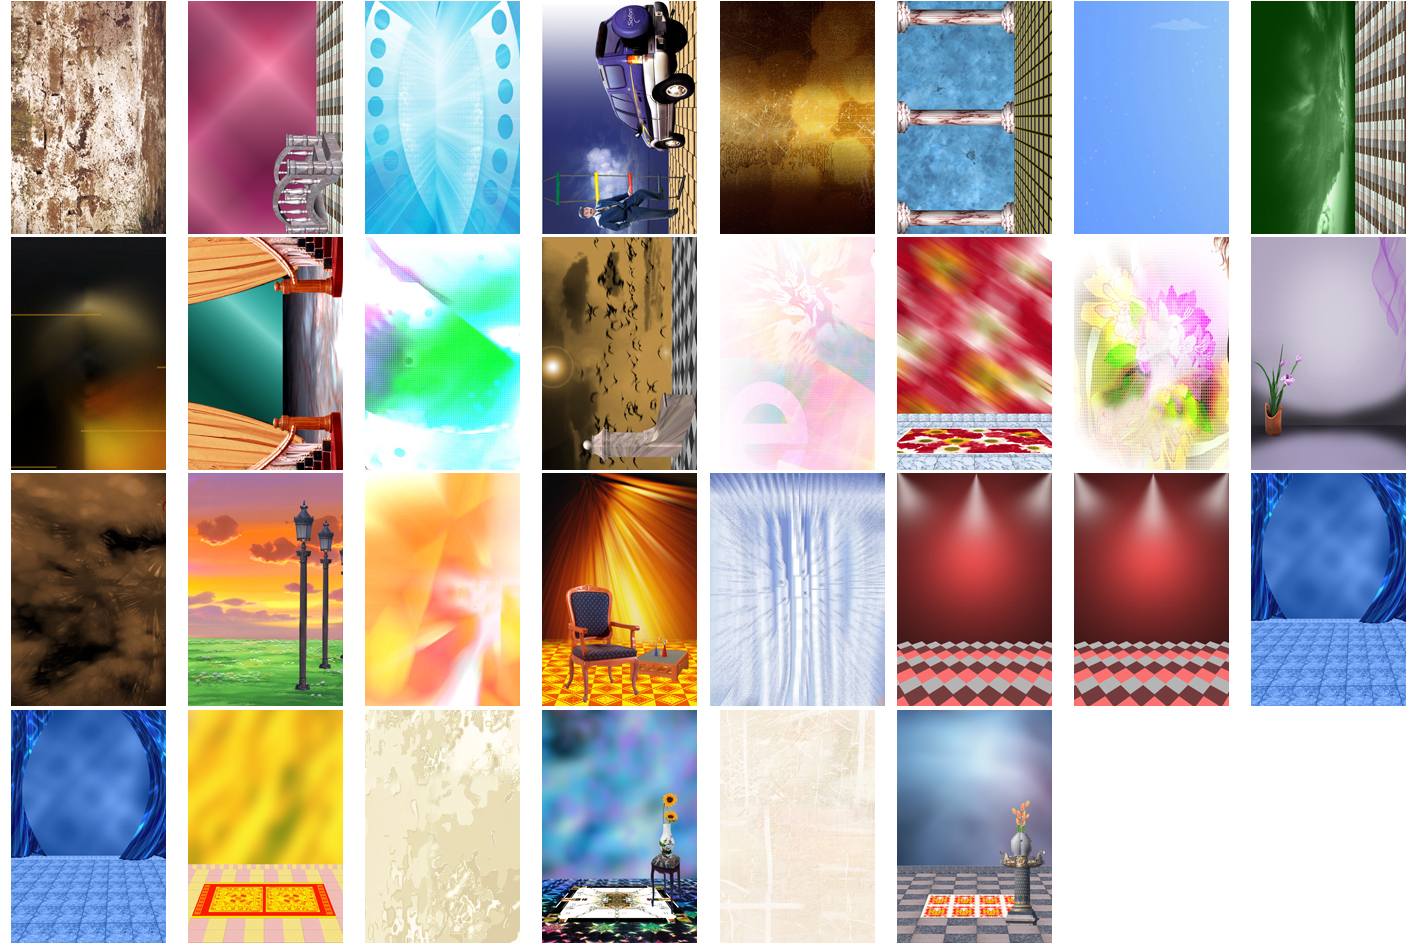 Studio Background Vol - 02